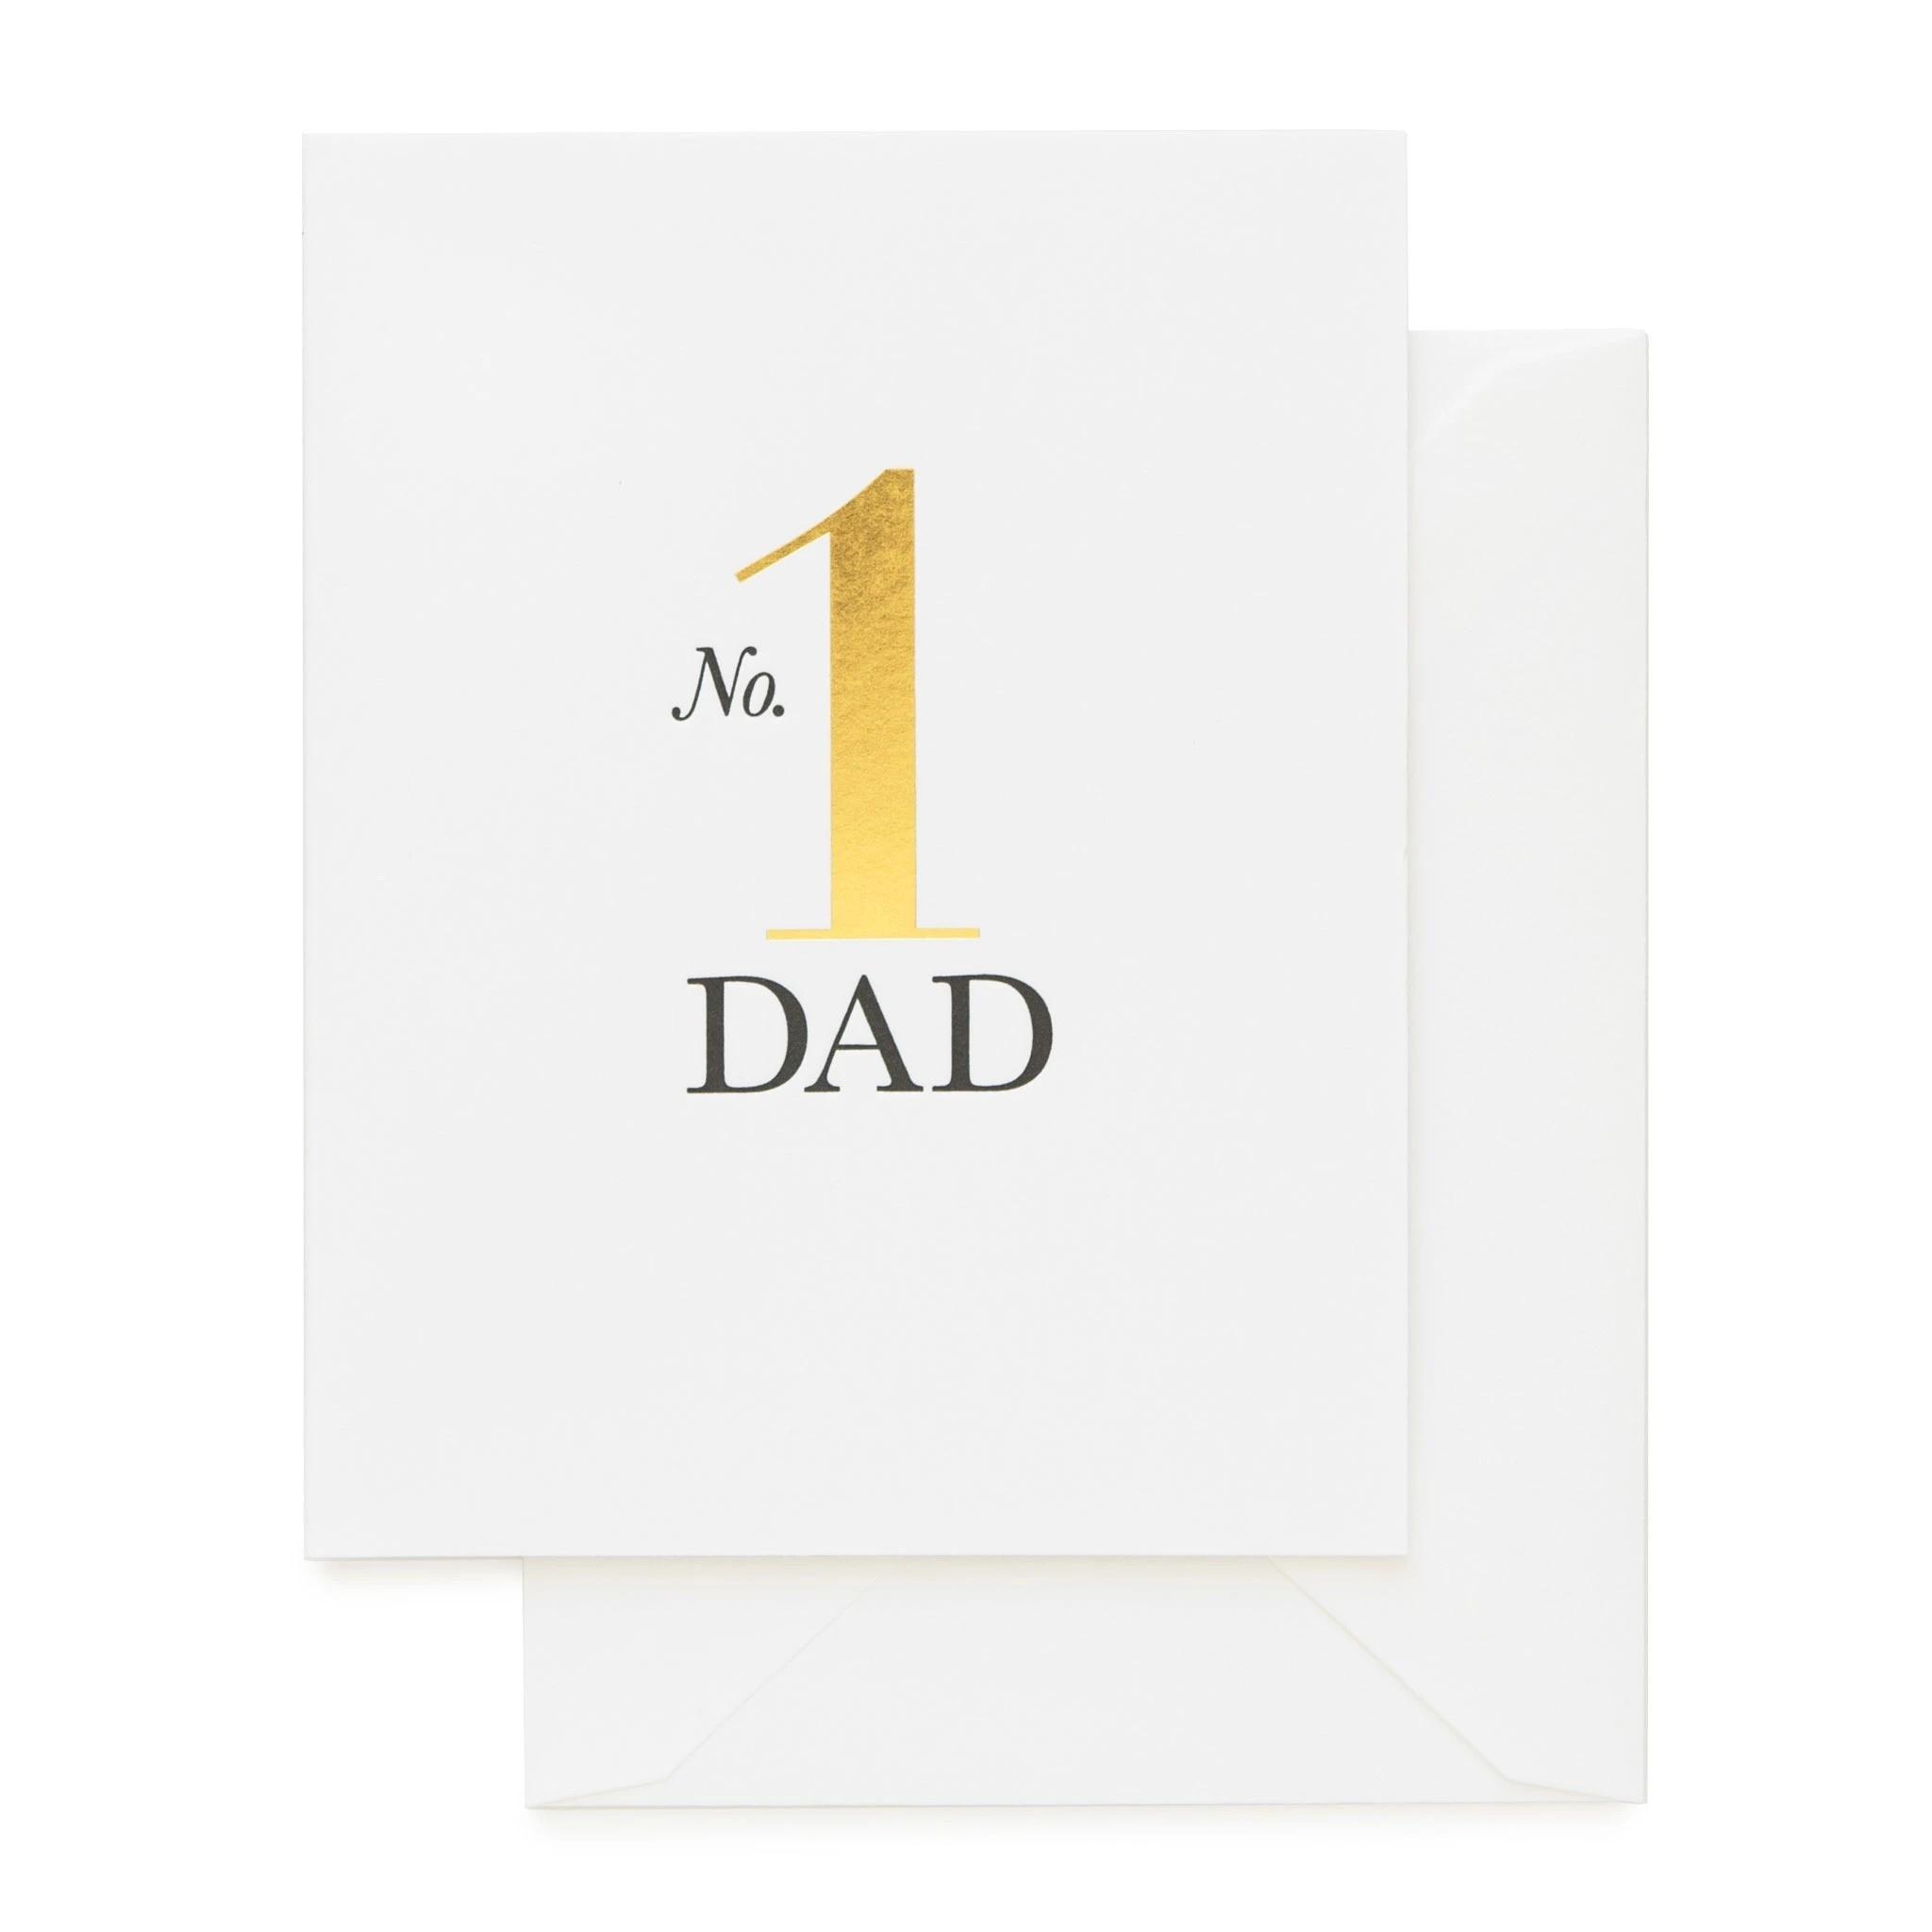 Sugar Paper - SUG No. 1 Dad Father's Day Card